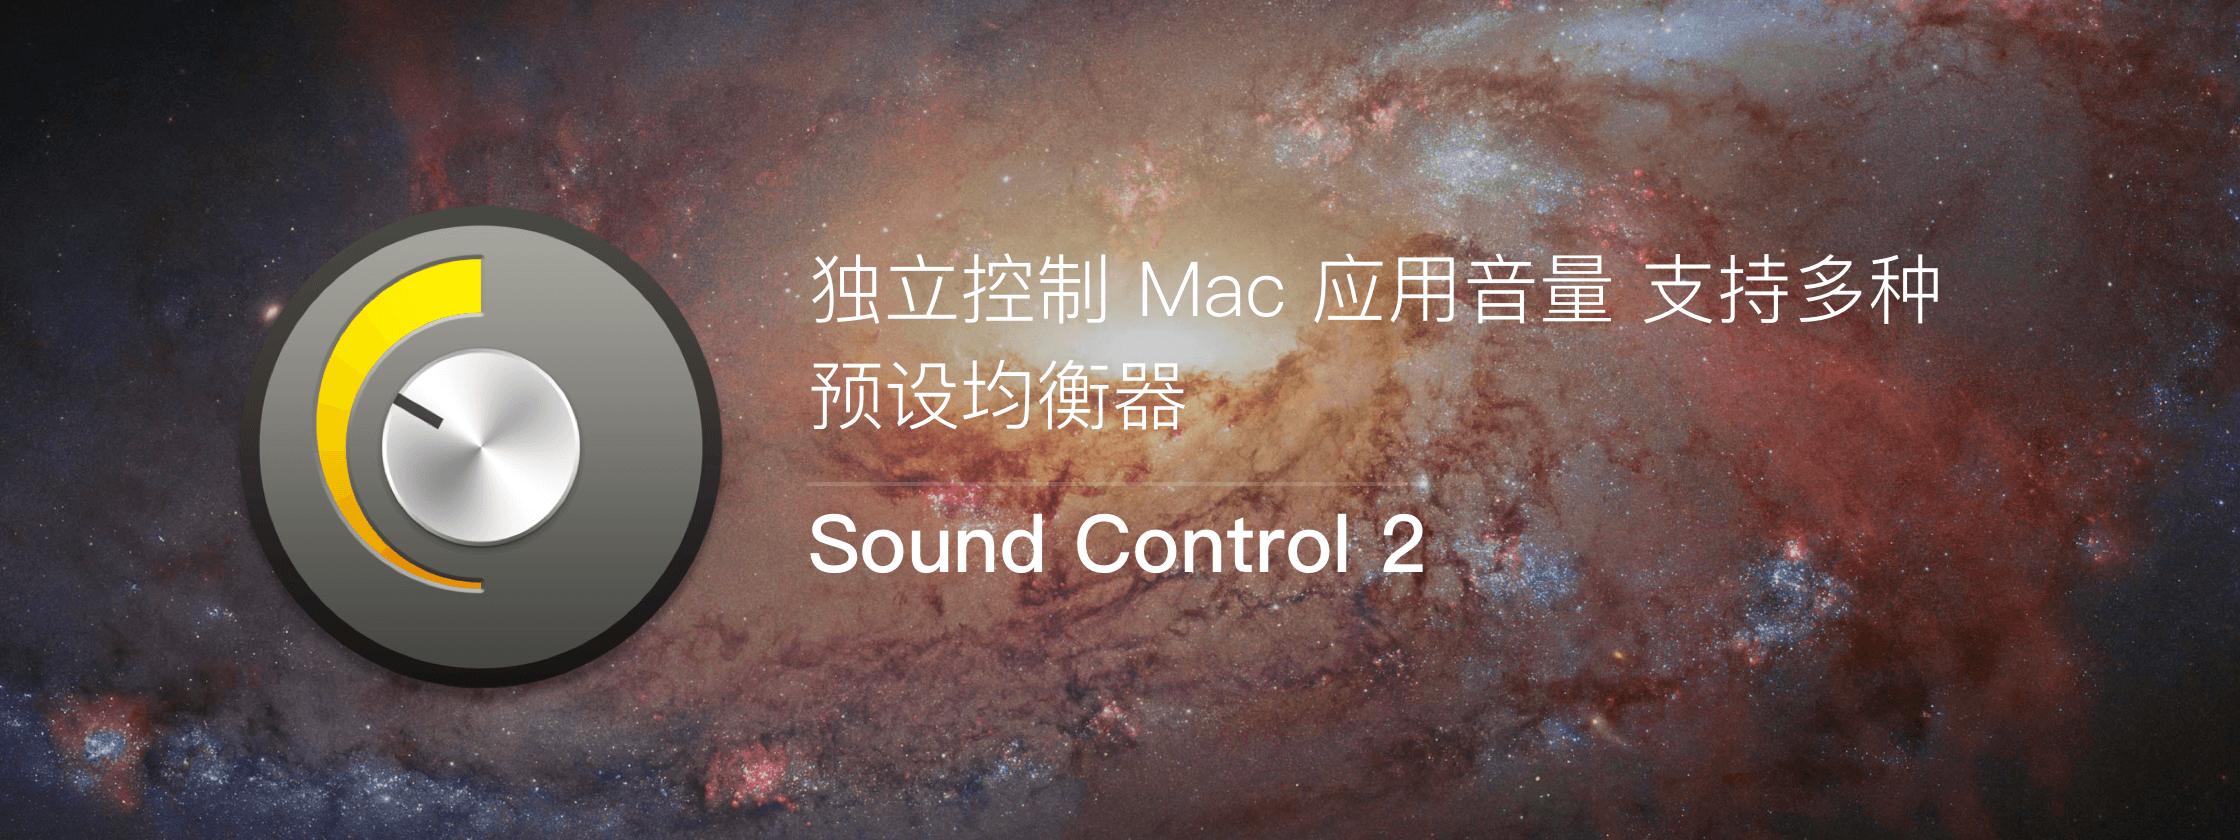 Sound Control,独立控制 App 音量